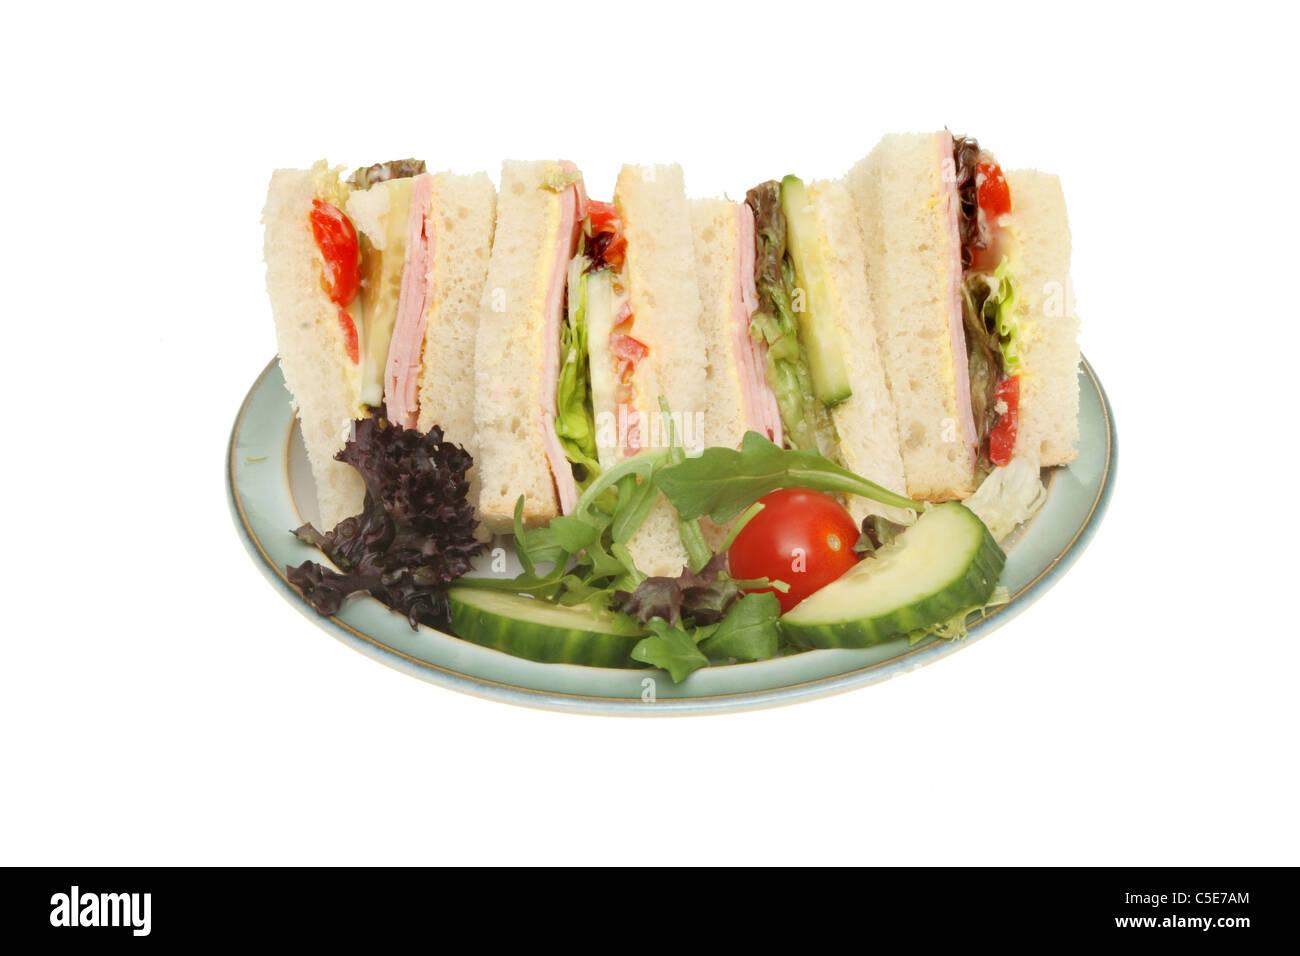 Ham Salad Sandwich With A Salad Garnish On A Plate Stock